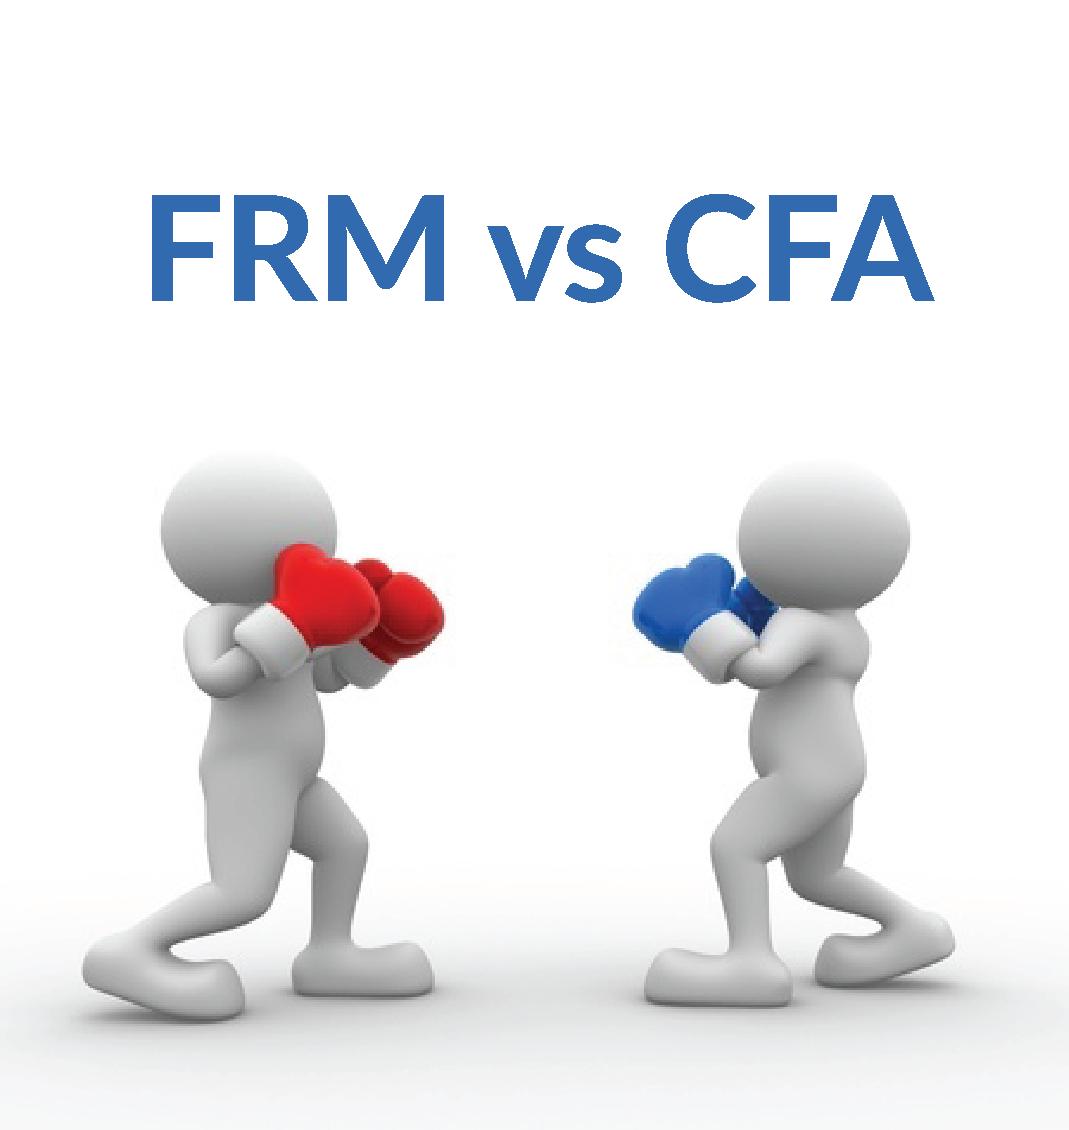 Frm Vs Cfa Whats The Better Choice Simple Comparison